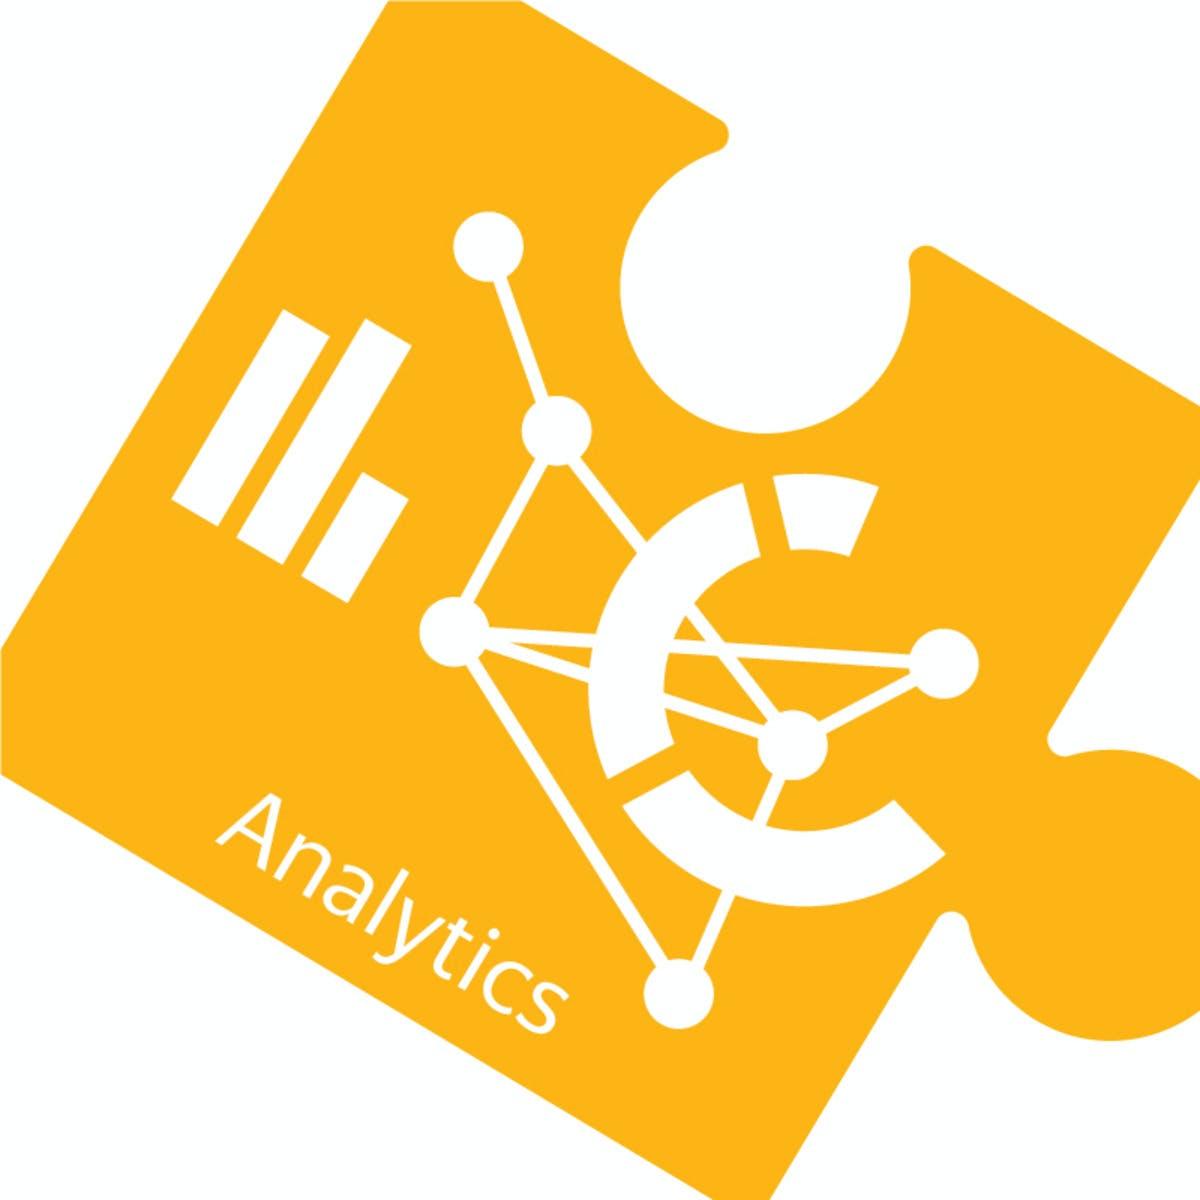 Big Data Analysis: Hive, Spark SQL, DataFrames and GraphFrames